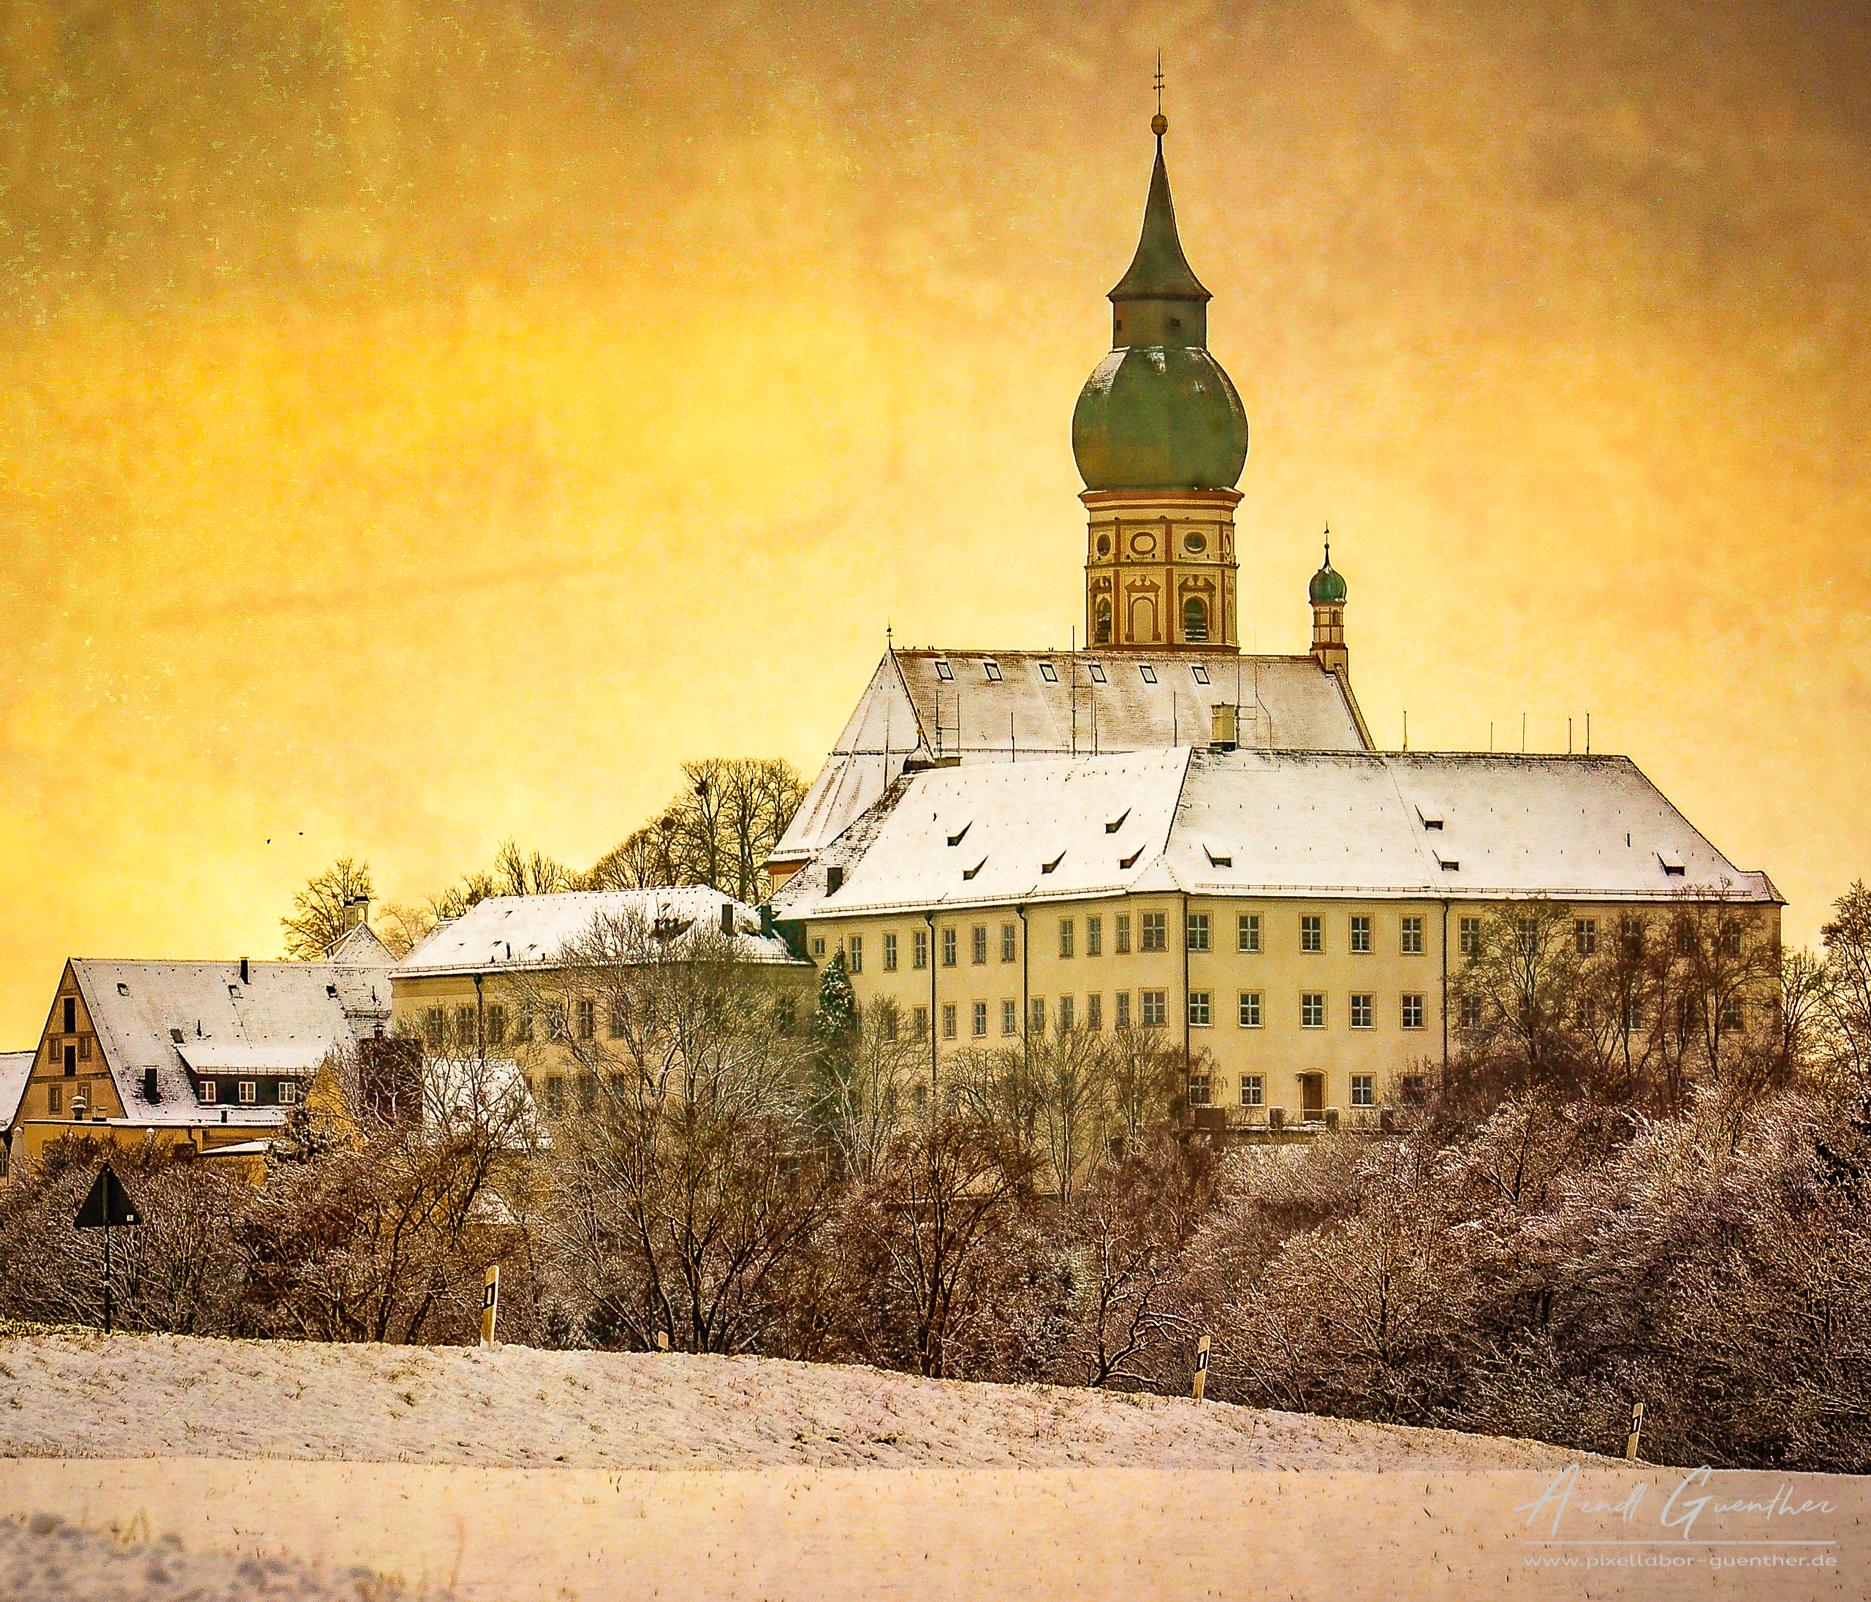 Kloster im Winter, Germany